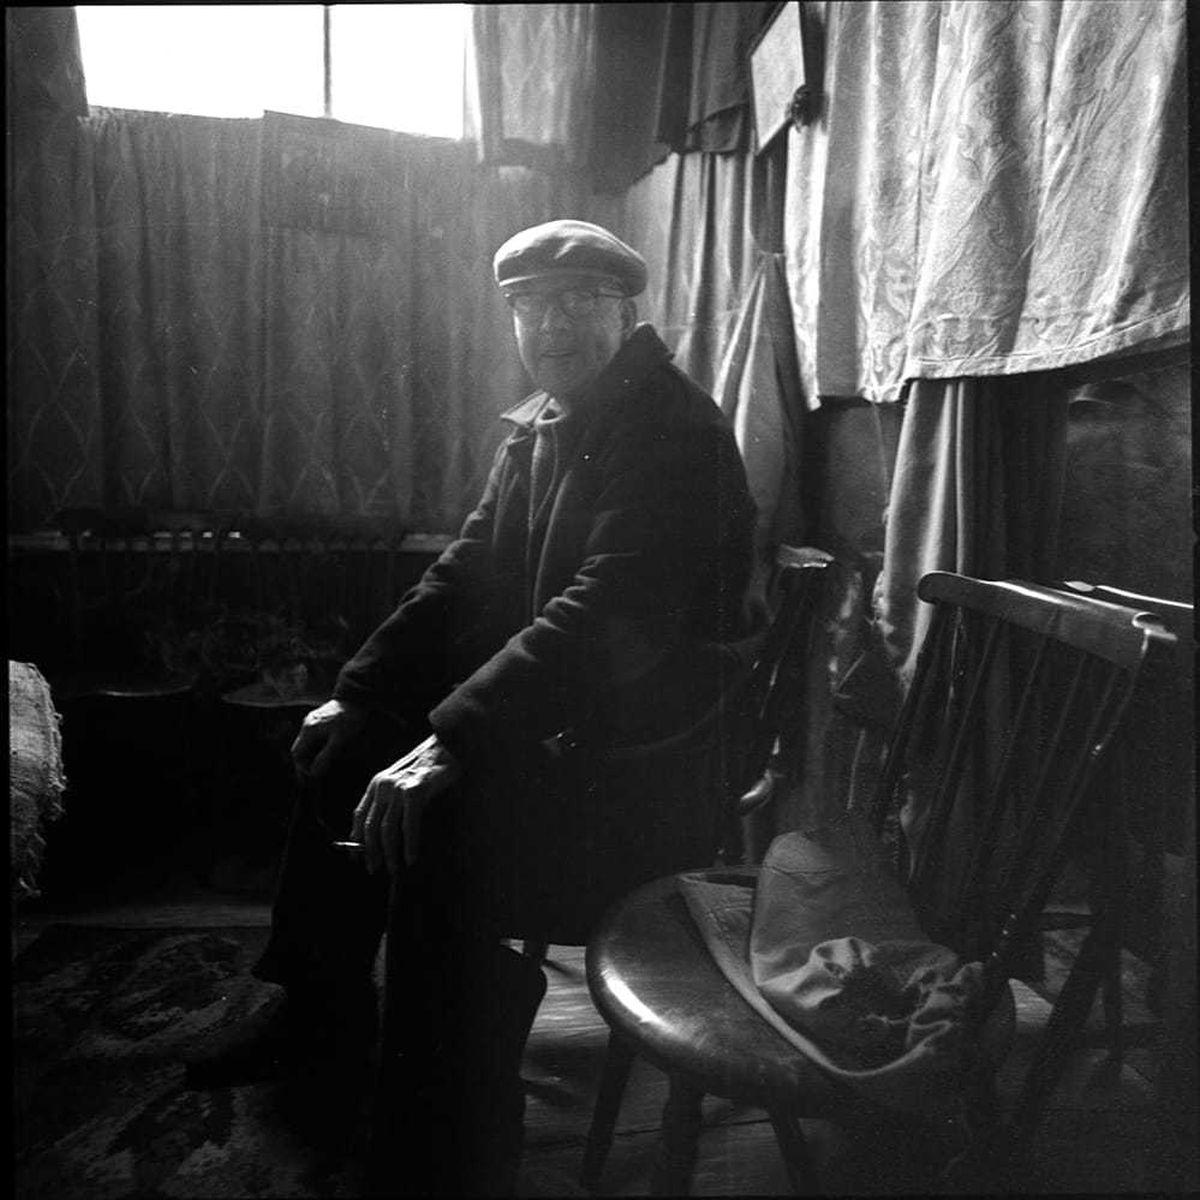 A man waiting for a haircut at Teddy McGovan's barbershop